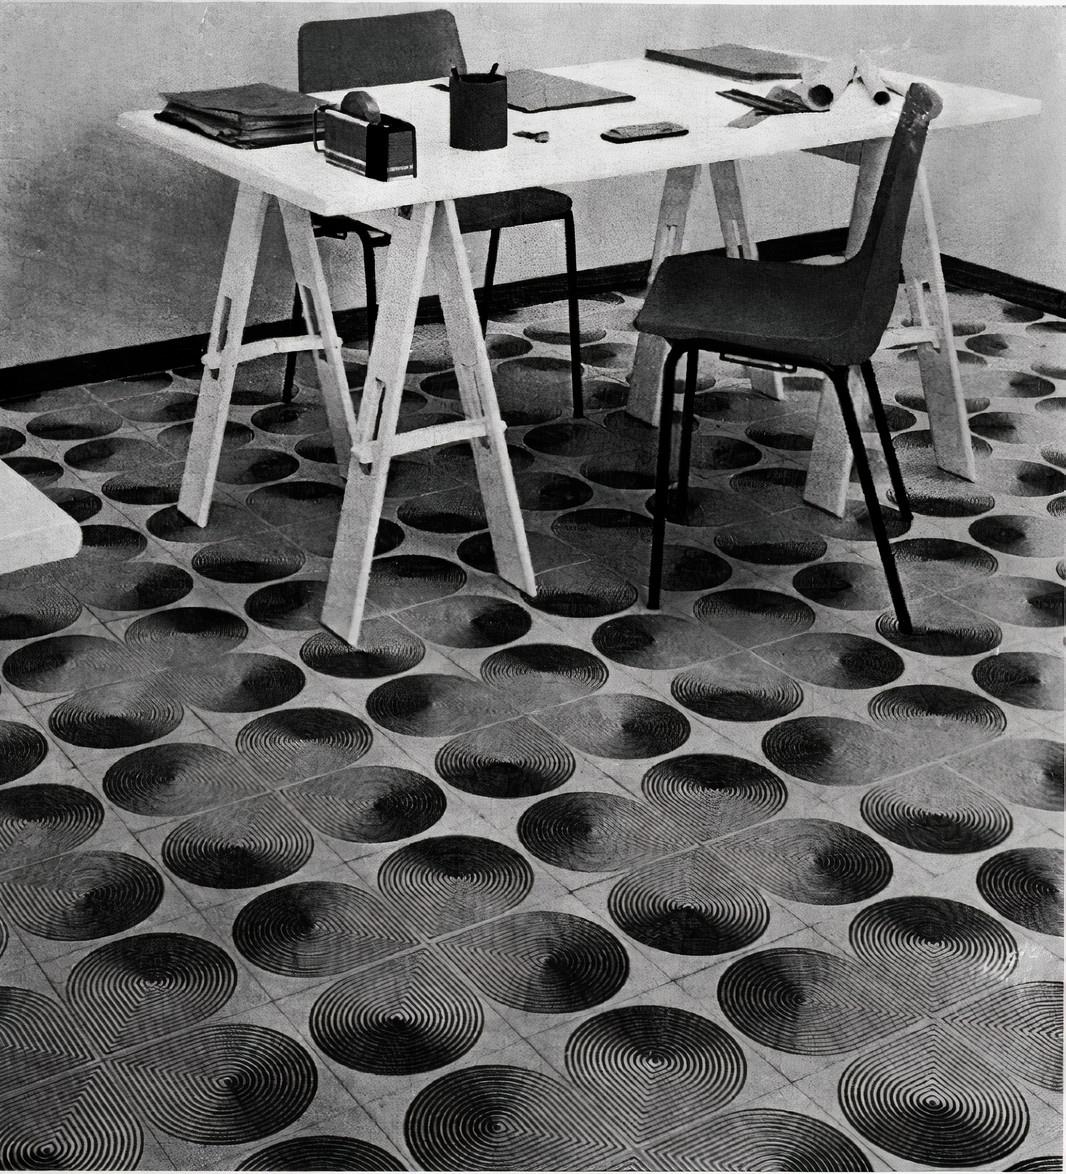 Franco Grignani for Ceramica Gresparma